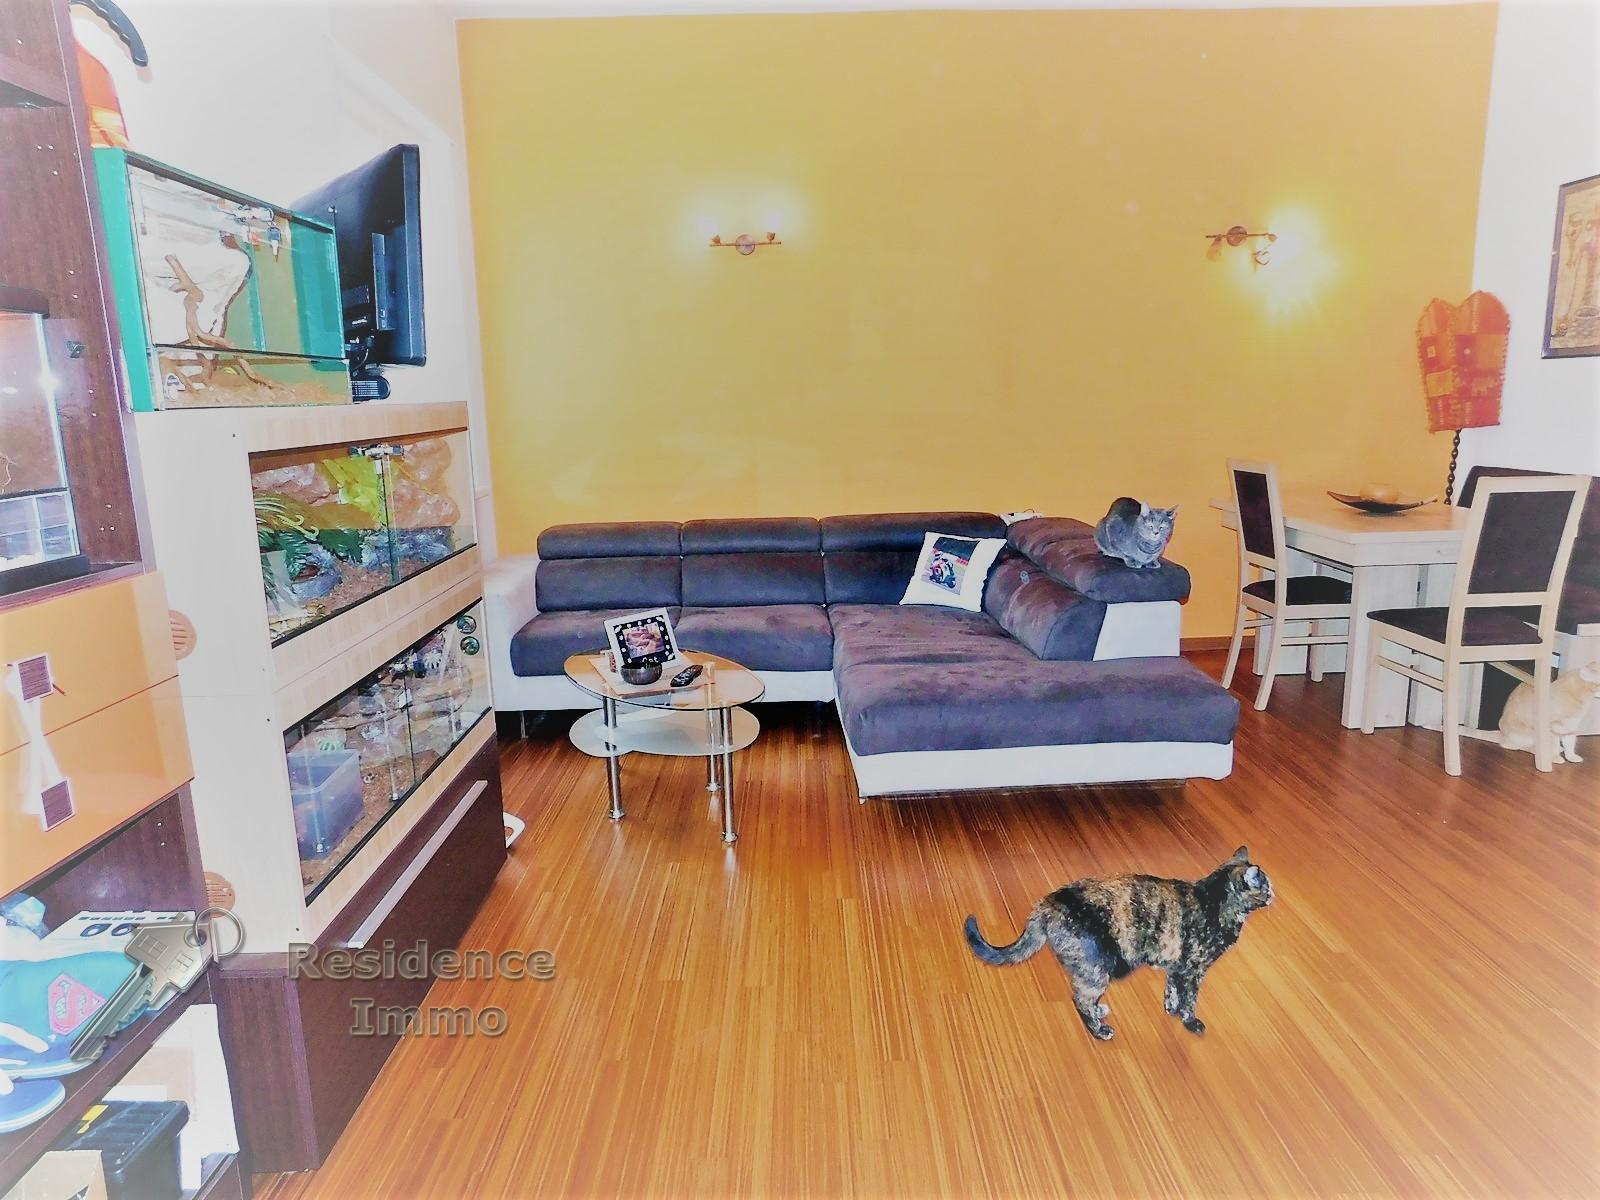 wohnung kaufen in bolzano bozen kodex 2080. Black Bedroom Furniture Sets. Home Design Ideas